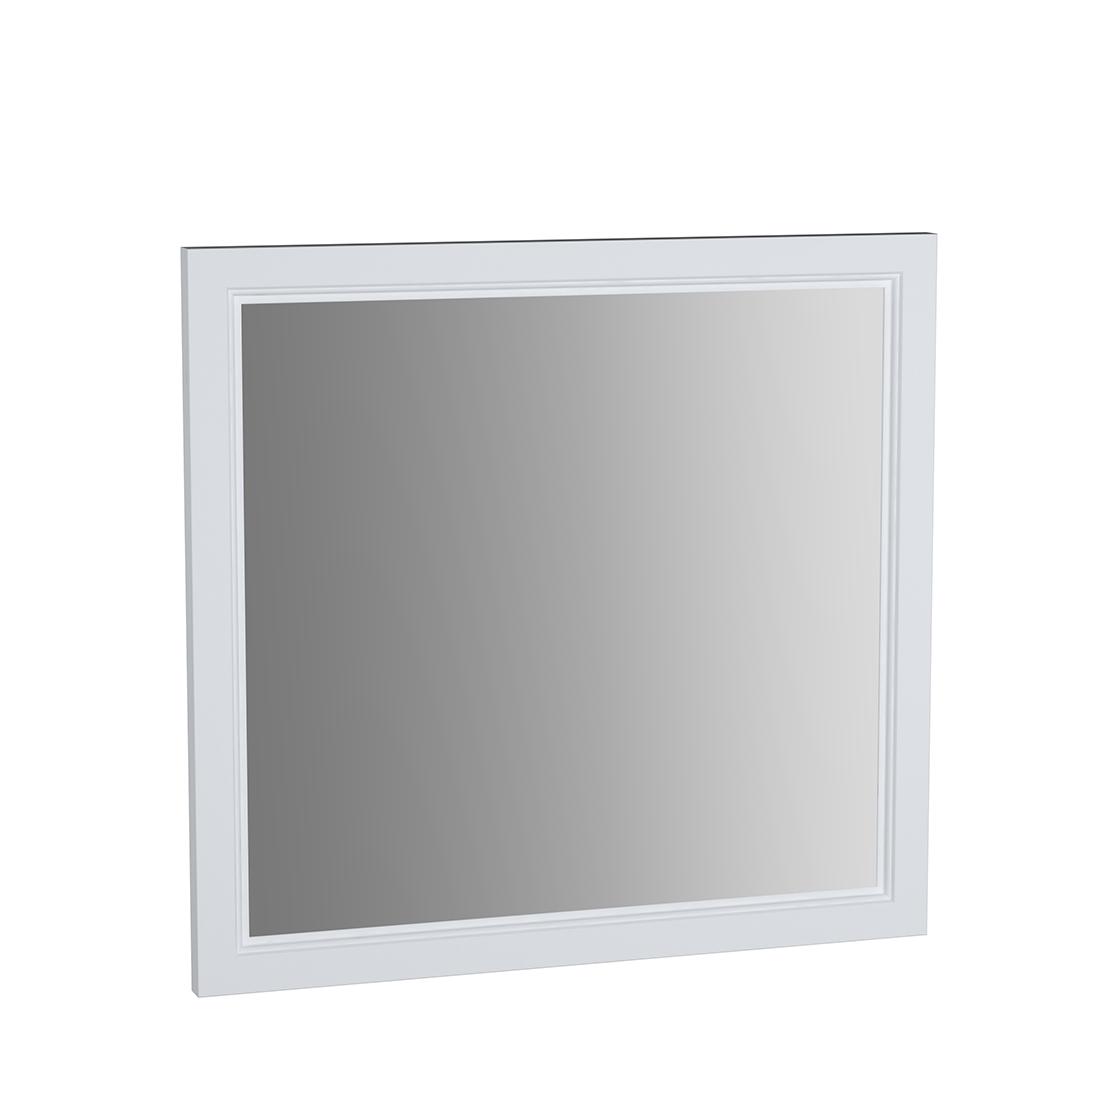 Valarte miroir, 80 cm, blanc mat